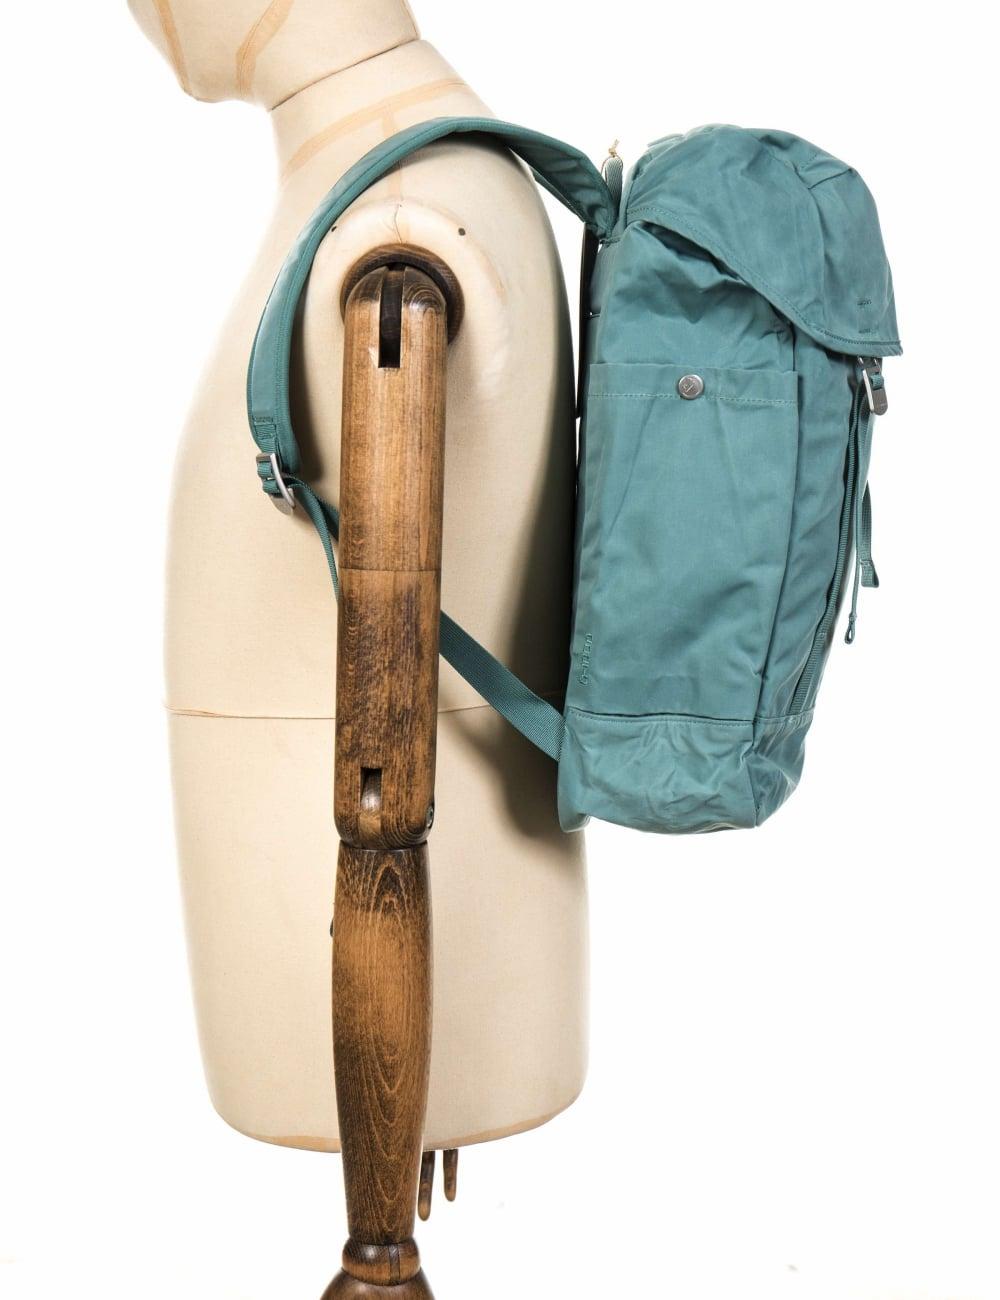 1b3af7d0a Fjallraven Greenland Top 20L Backpack - Frost Green - Accessories ...